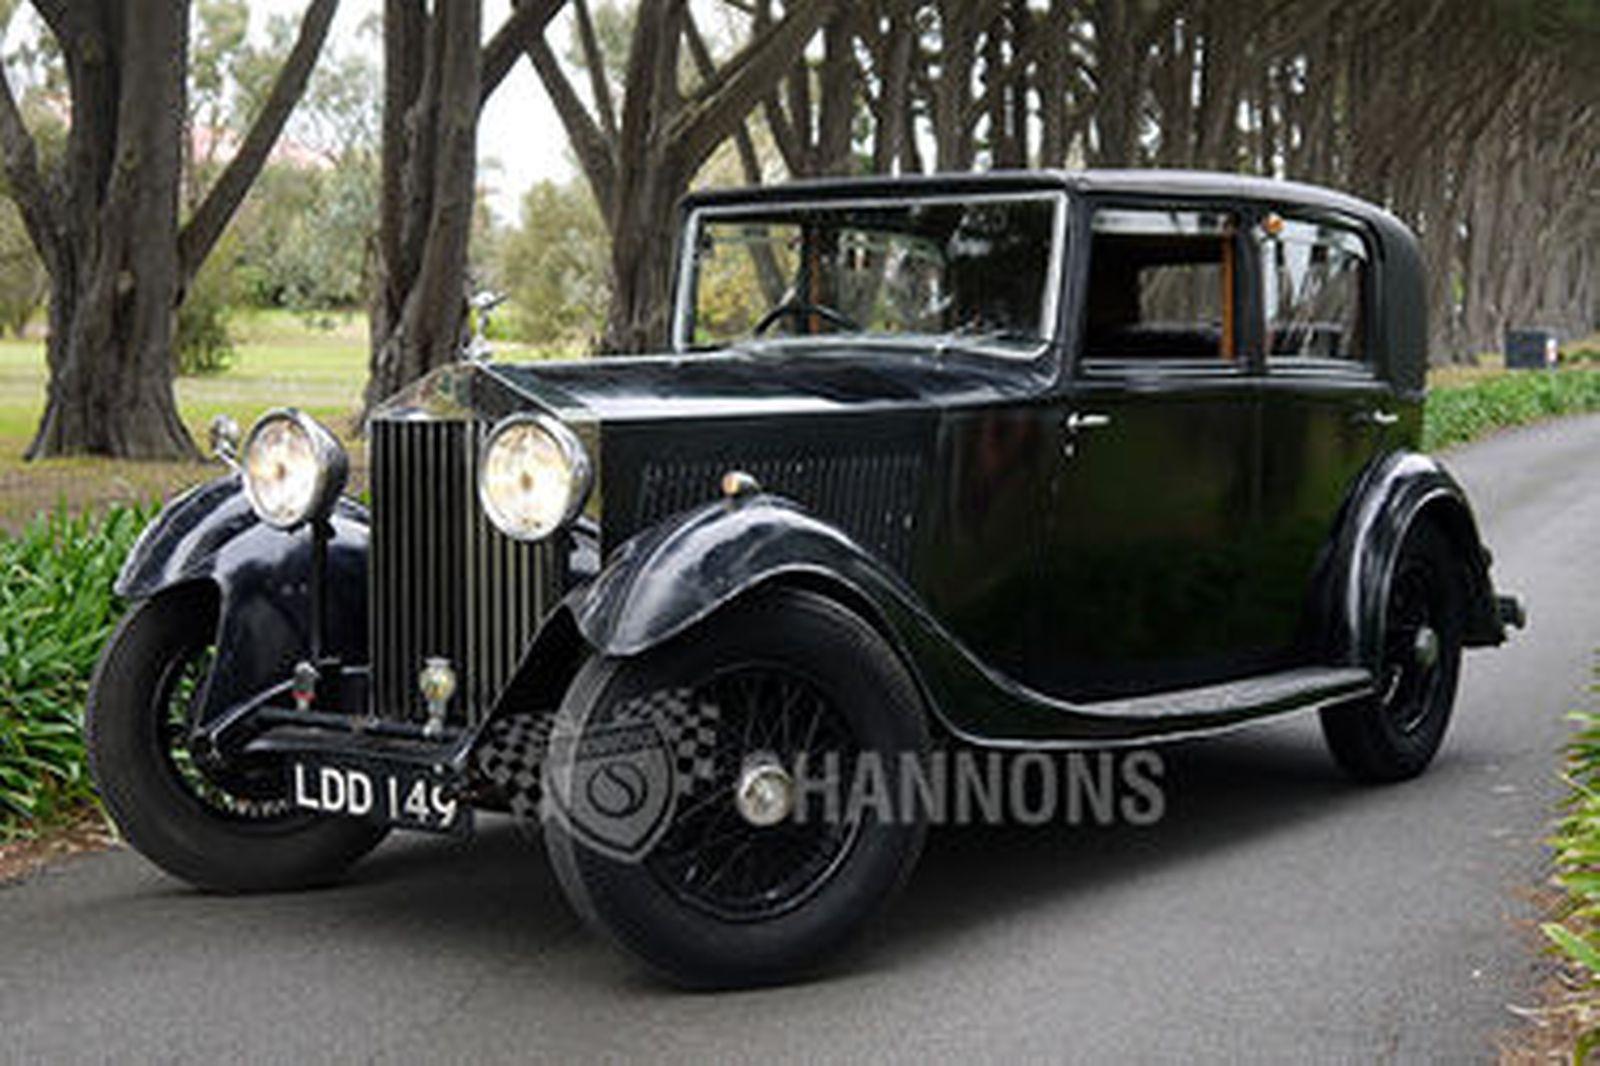 sold  rolls-royce 20  25 hj mulliner sports saloon auctions - lot 27